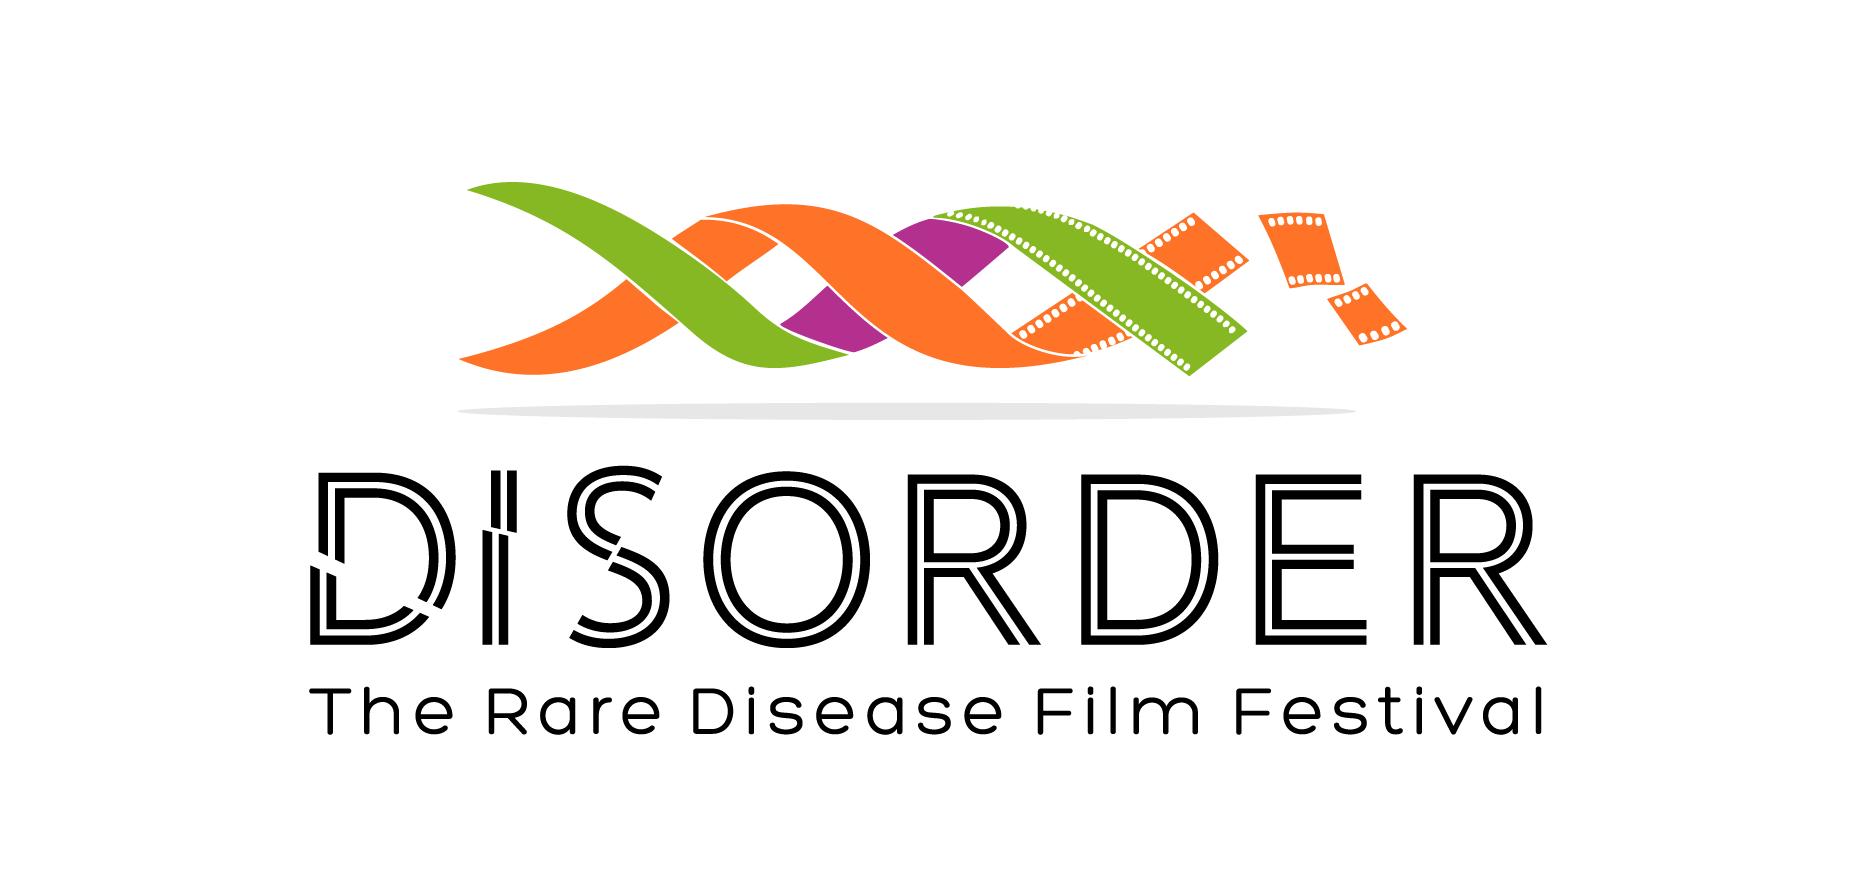 Disorder: Rare Disease Film Festival